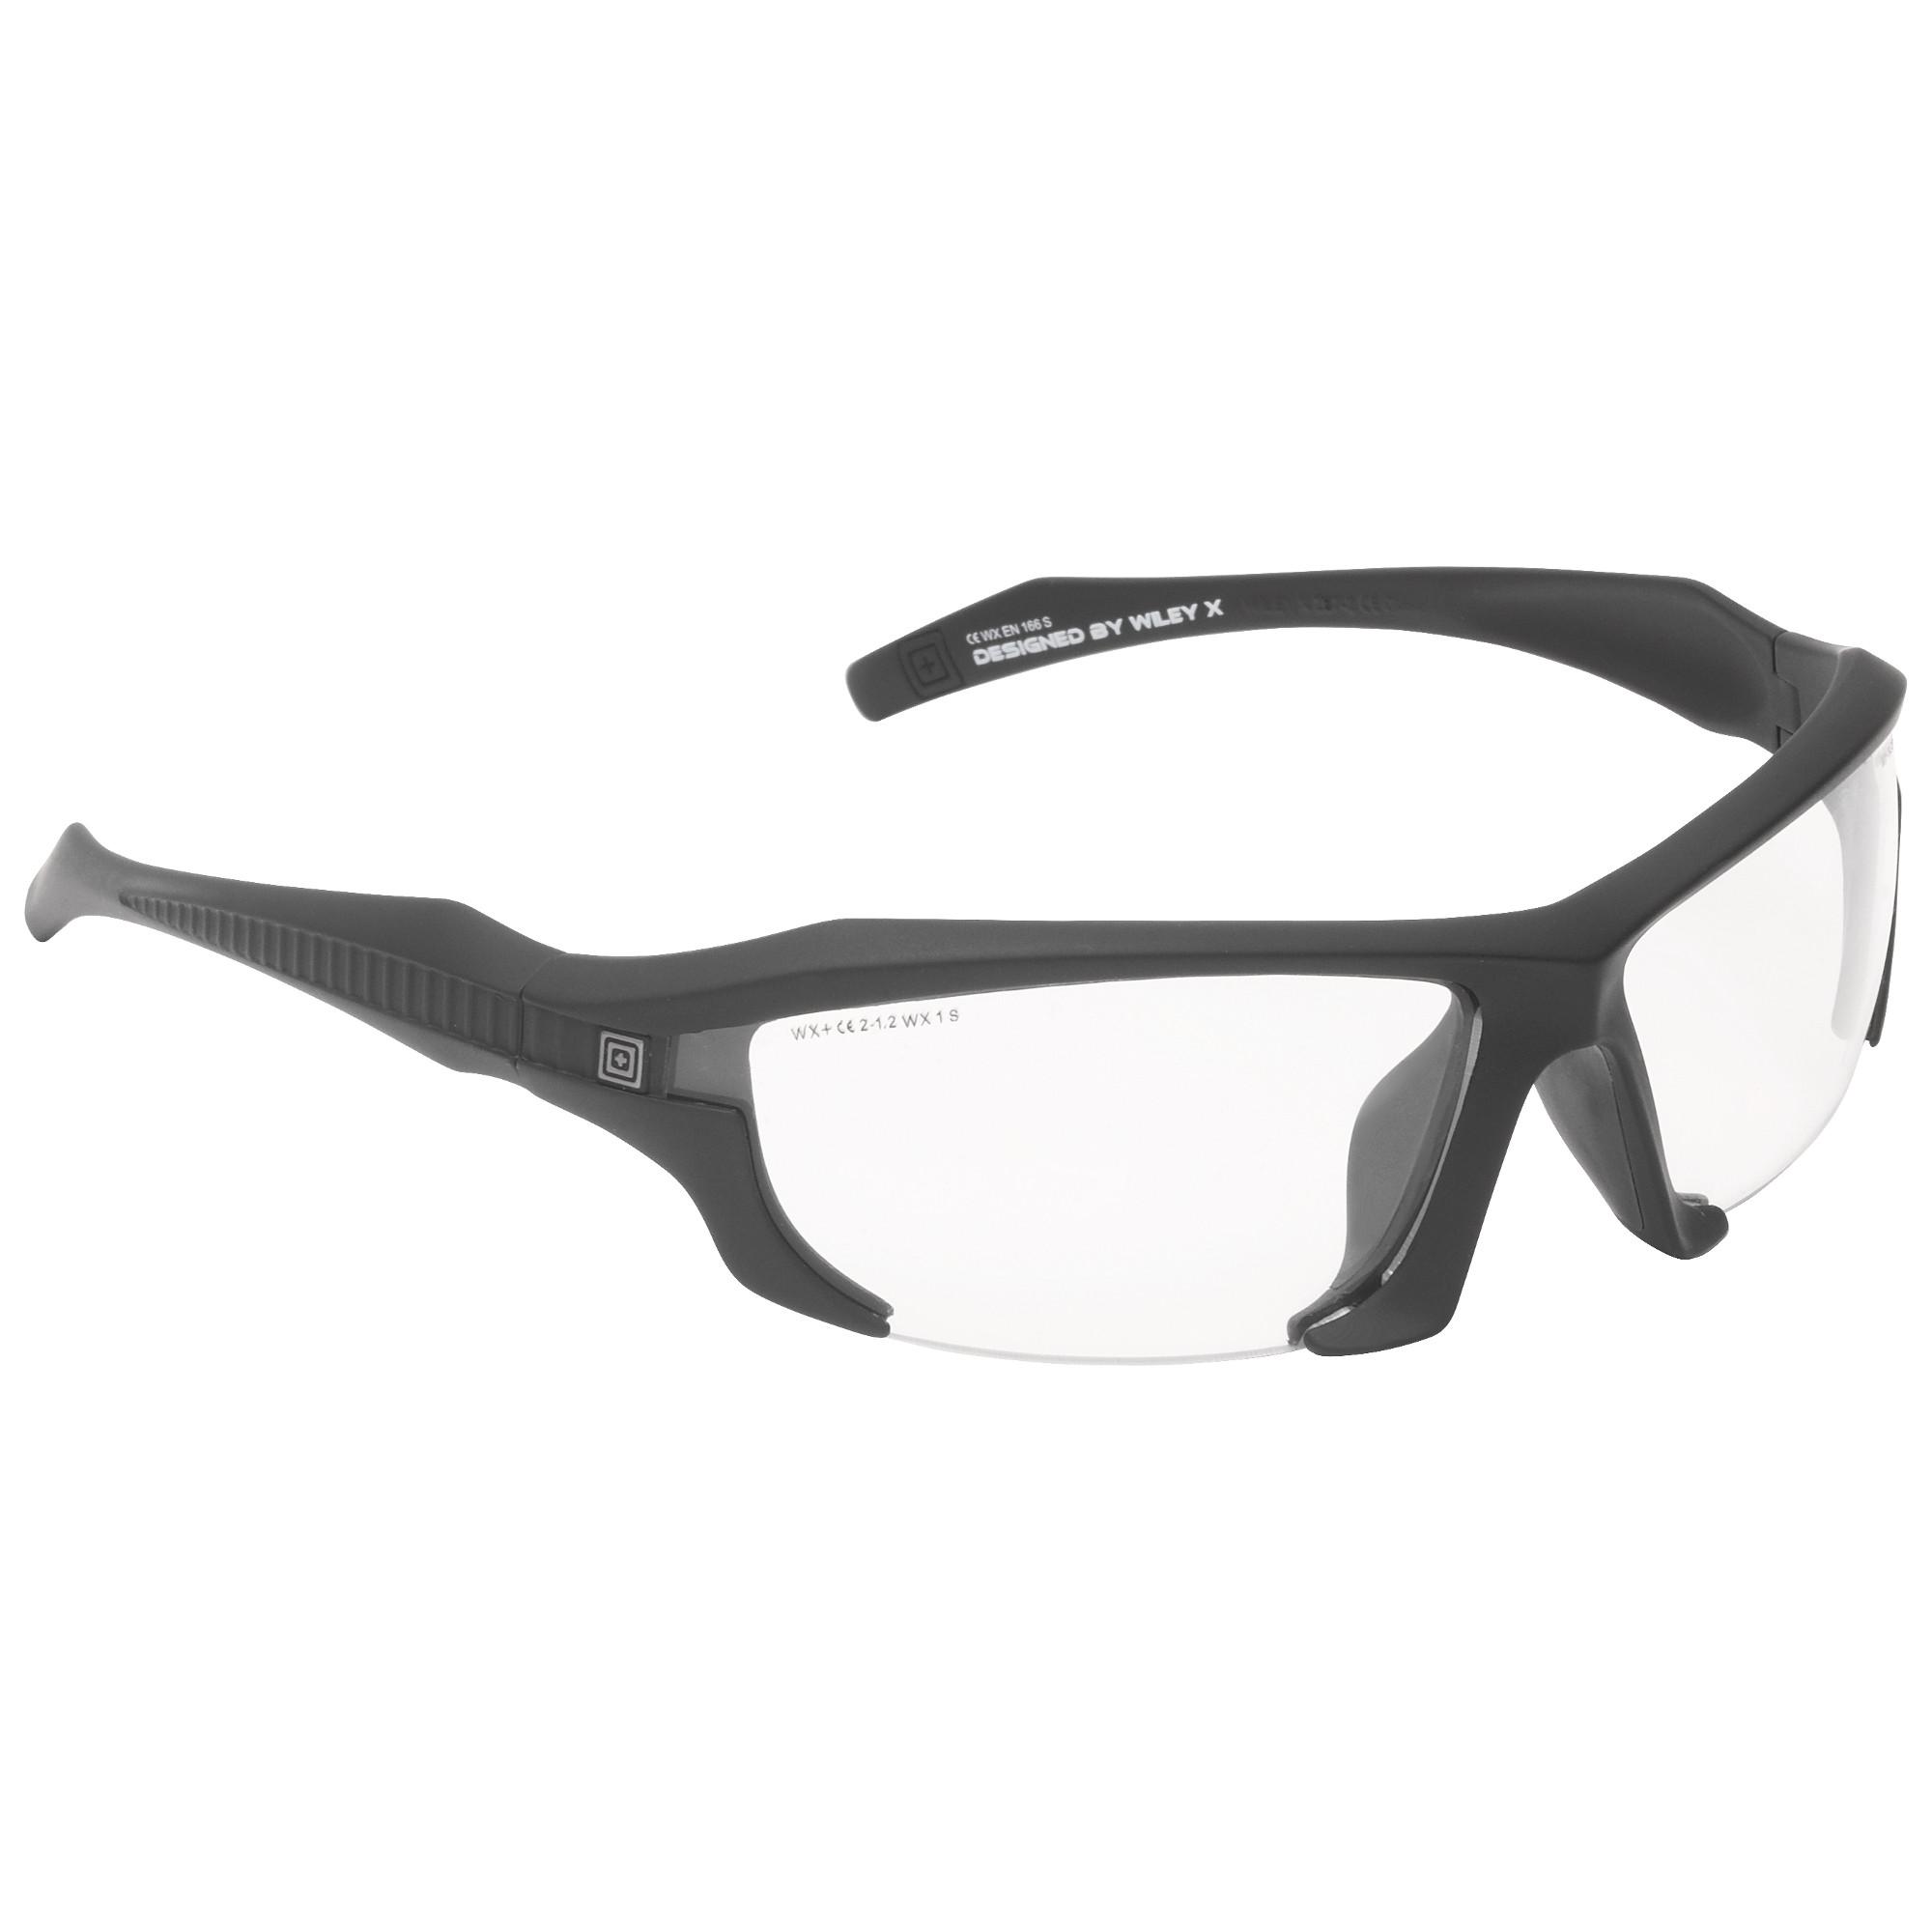 Buy 5.11 Tactical MenS Burner Half Frame Replacement Lenses - 5.11 ...